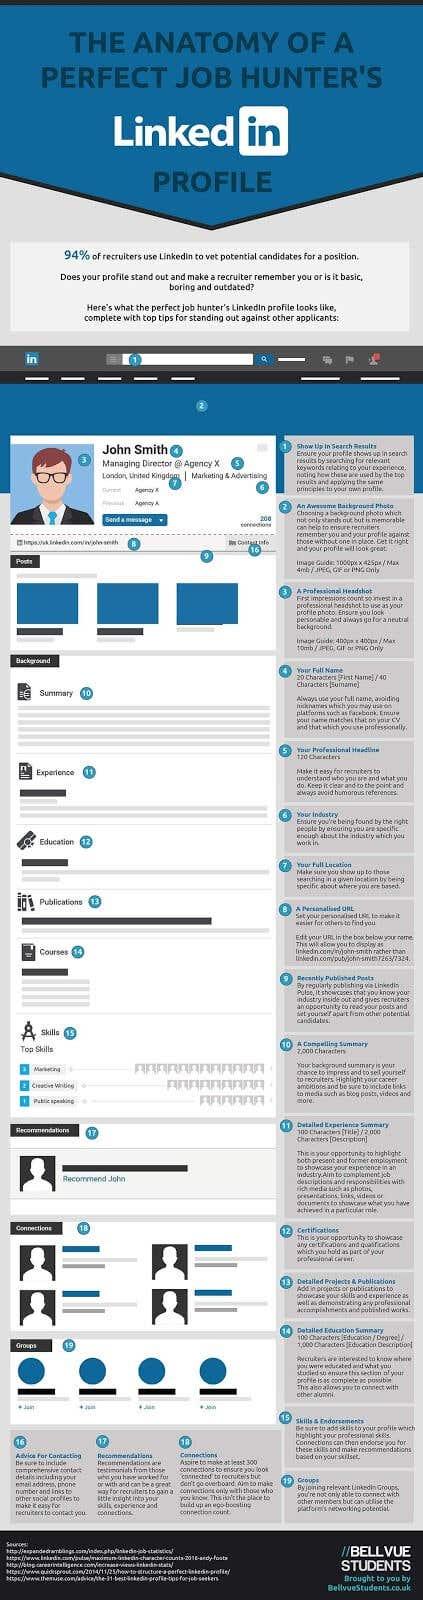 linkedin profile infographic